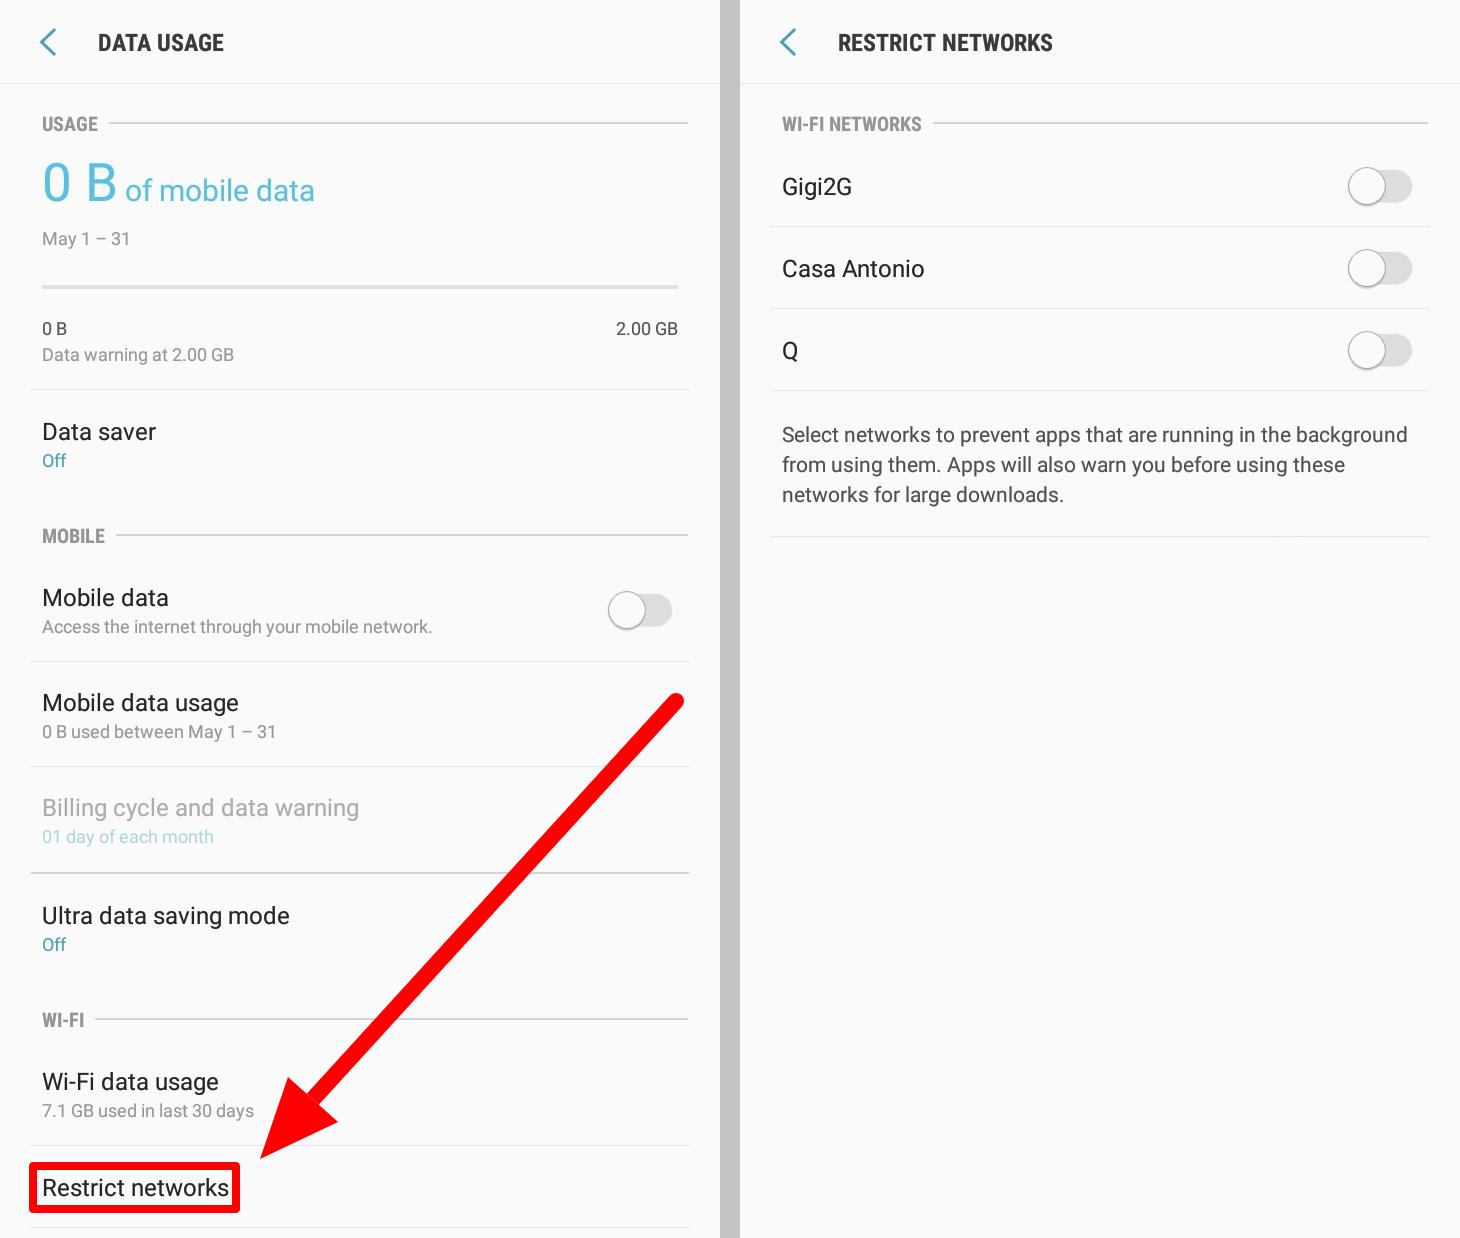 Restrict network settings